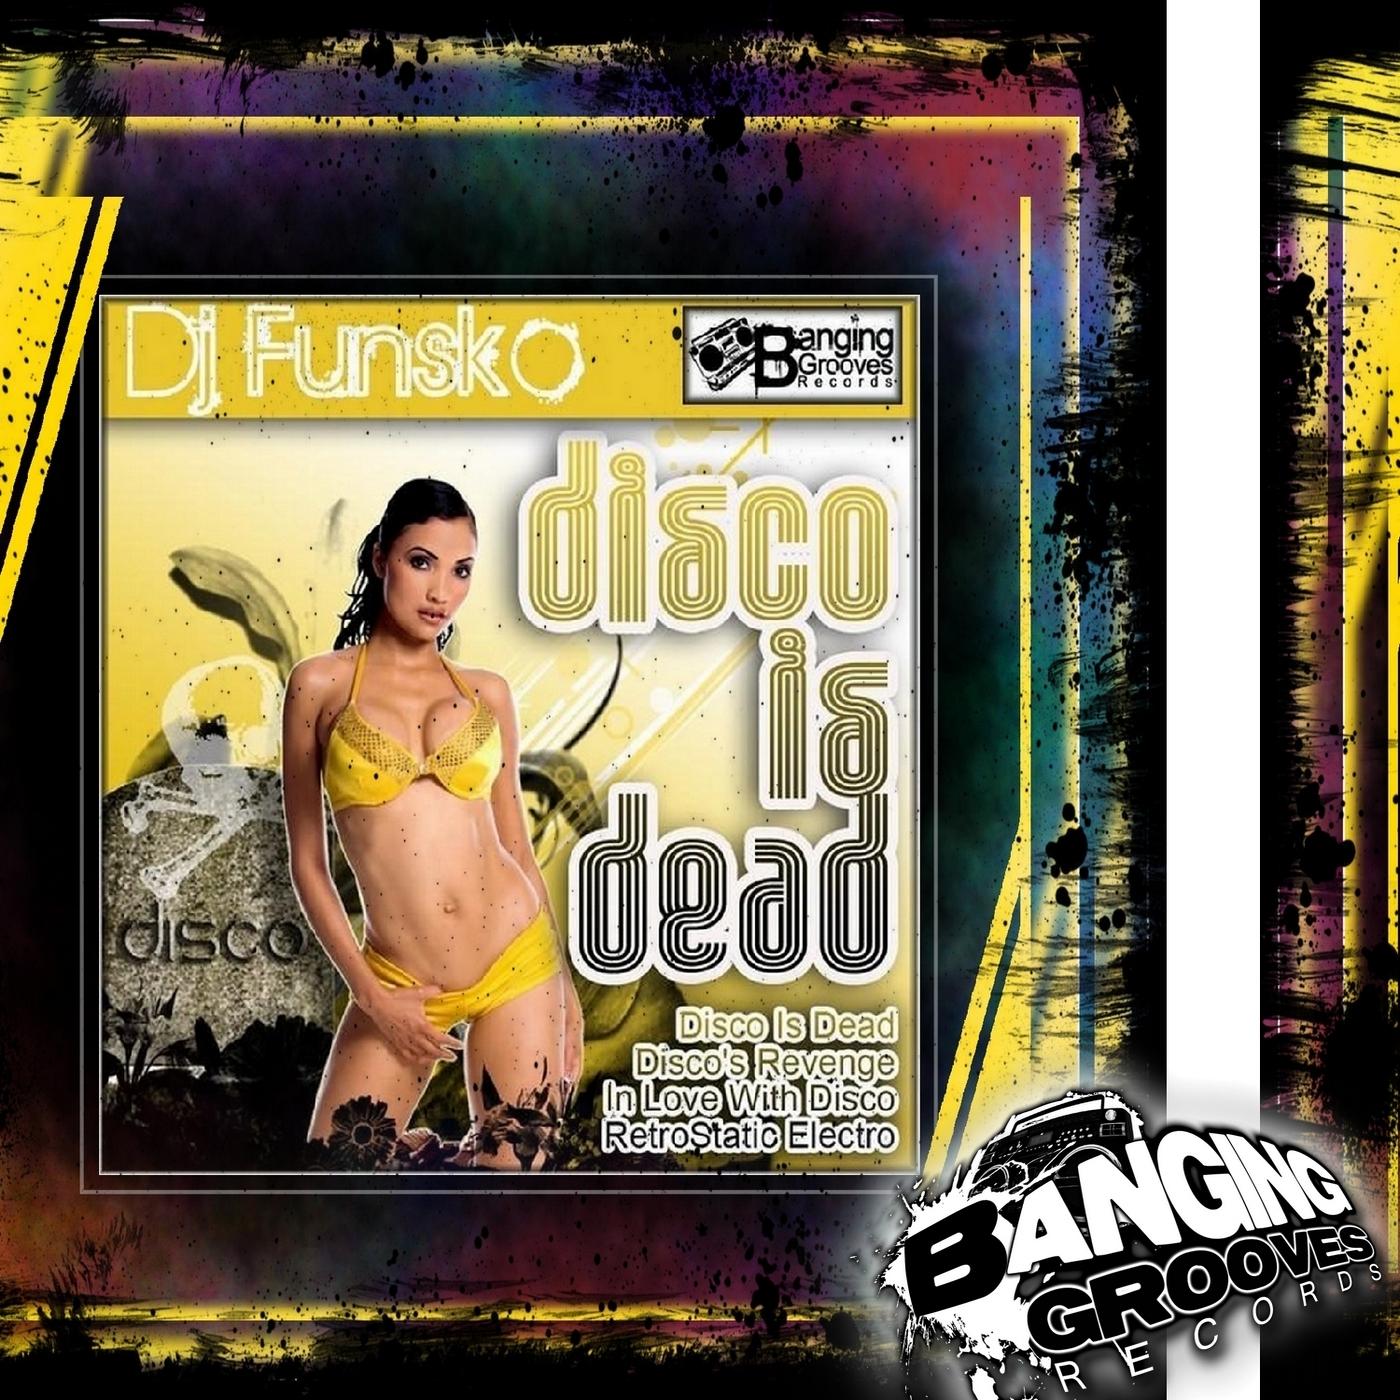 DJ Funsko - Disco Is Dead (Original mix)